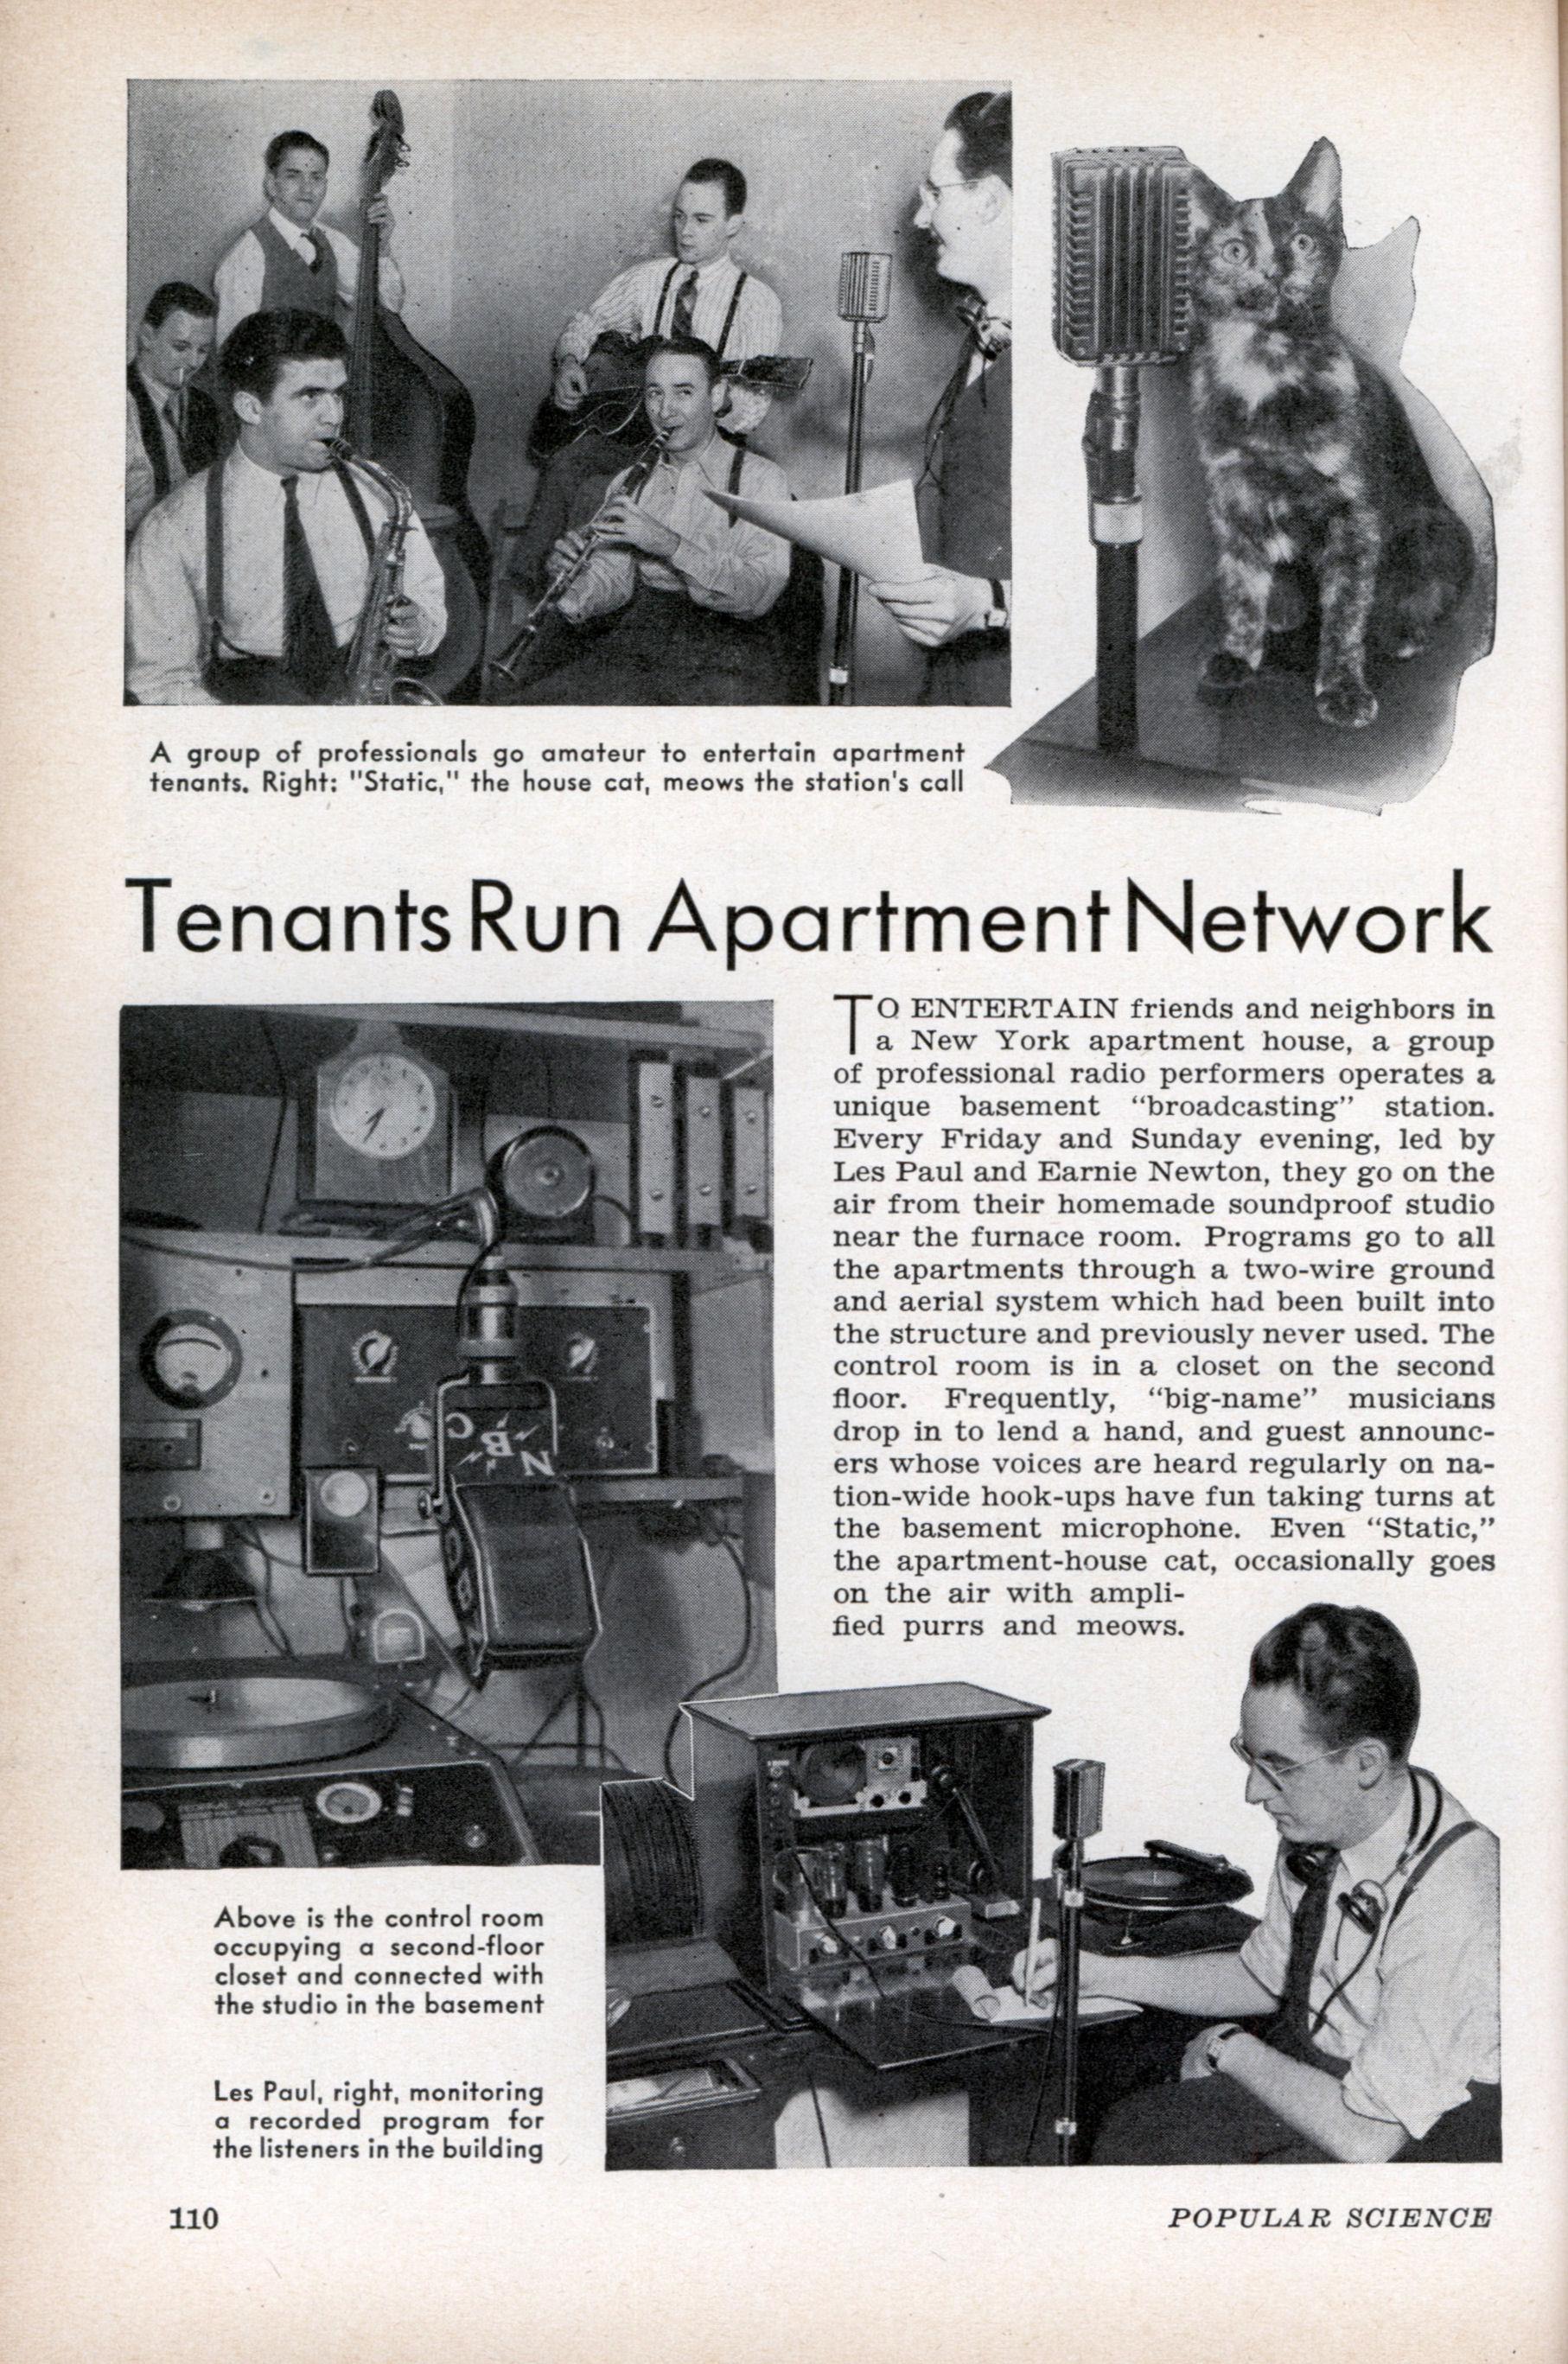 Tenants Run Apartment Network Modern Mechanix